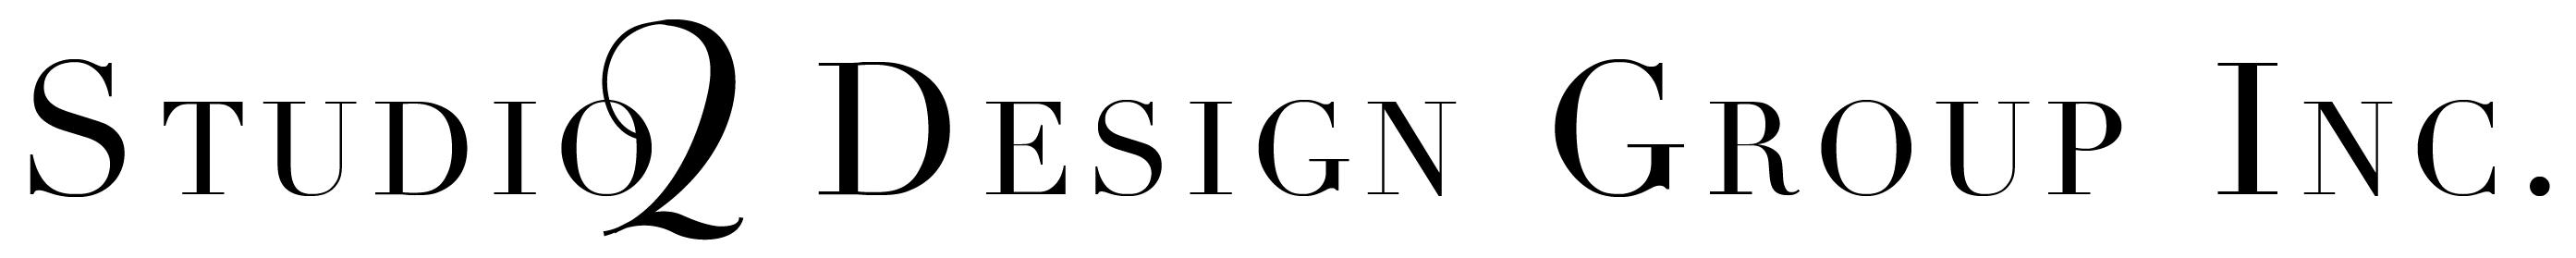 Studio 2 Design Group Inc